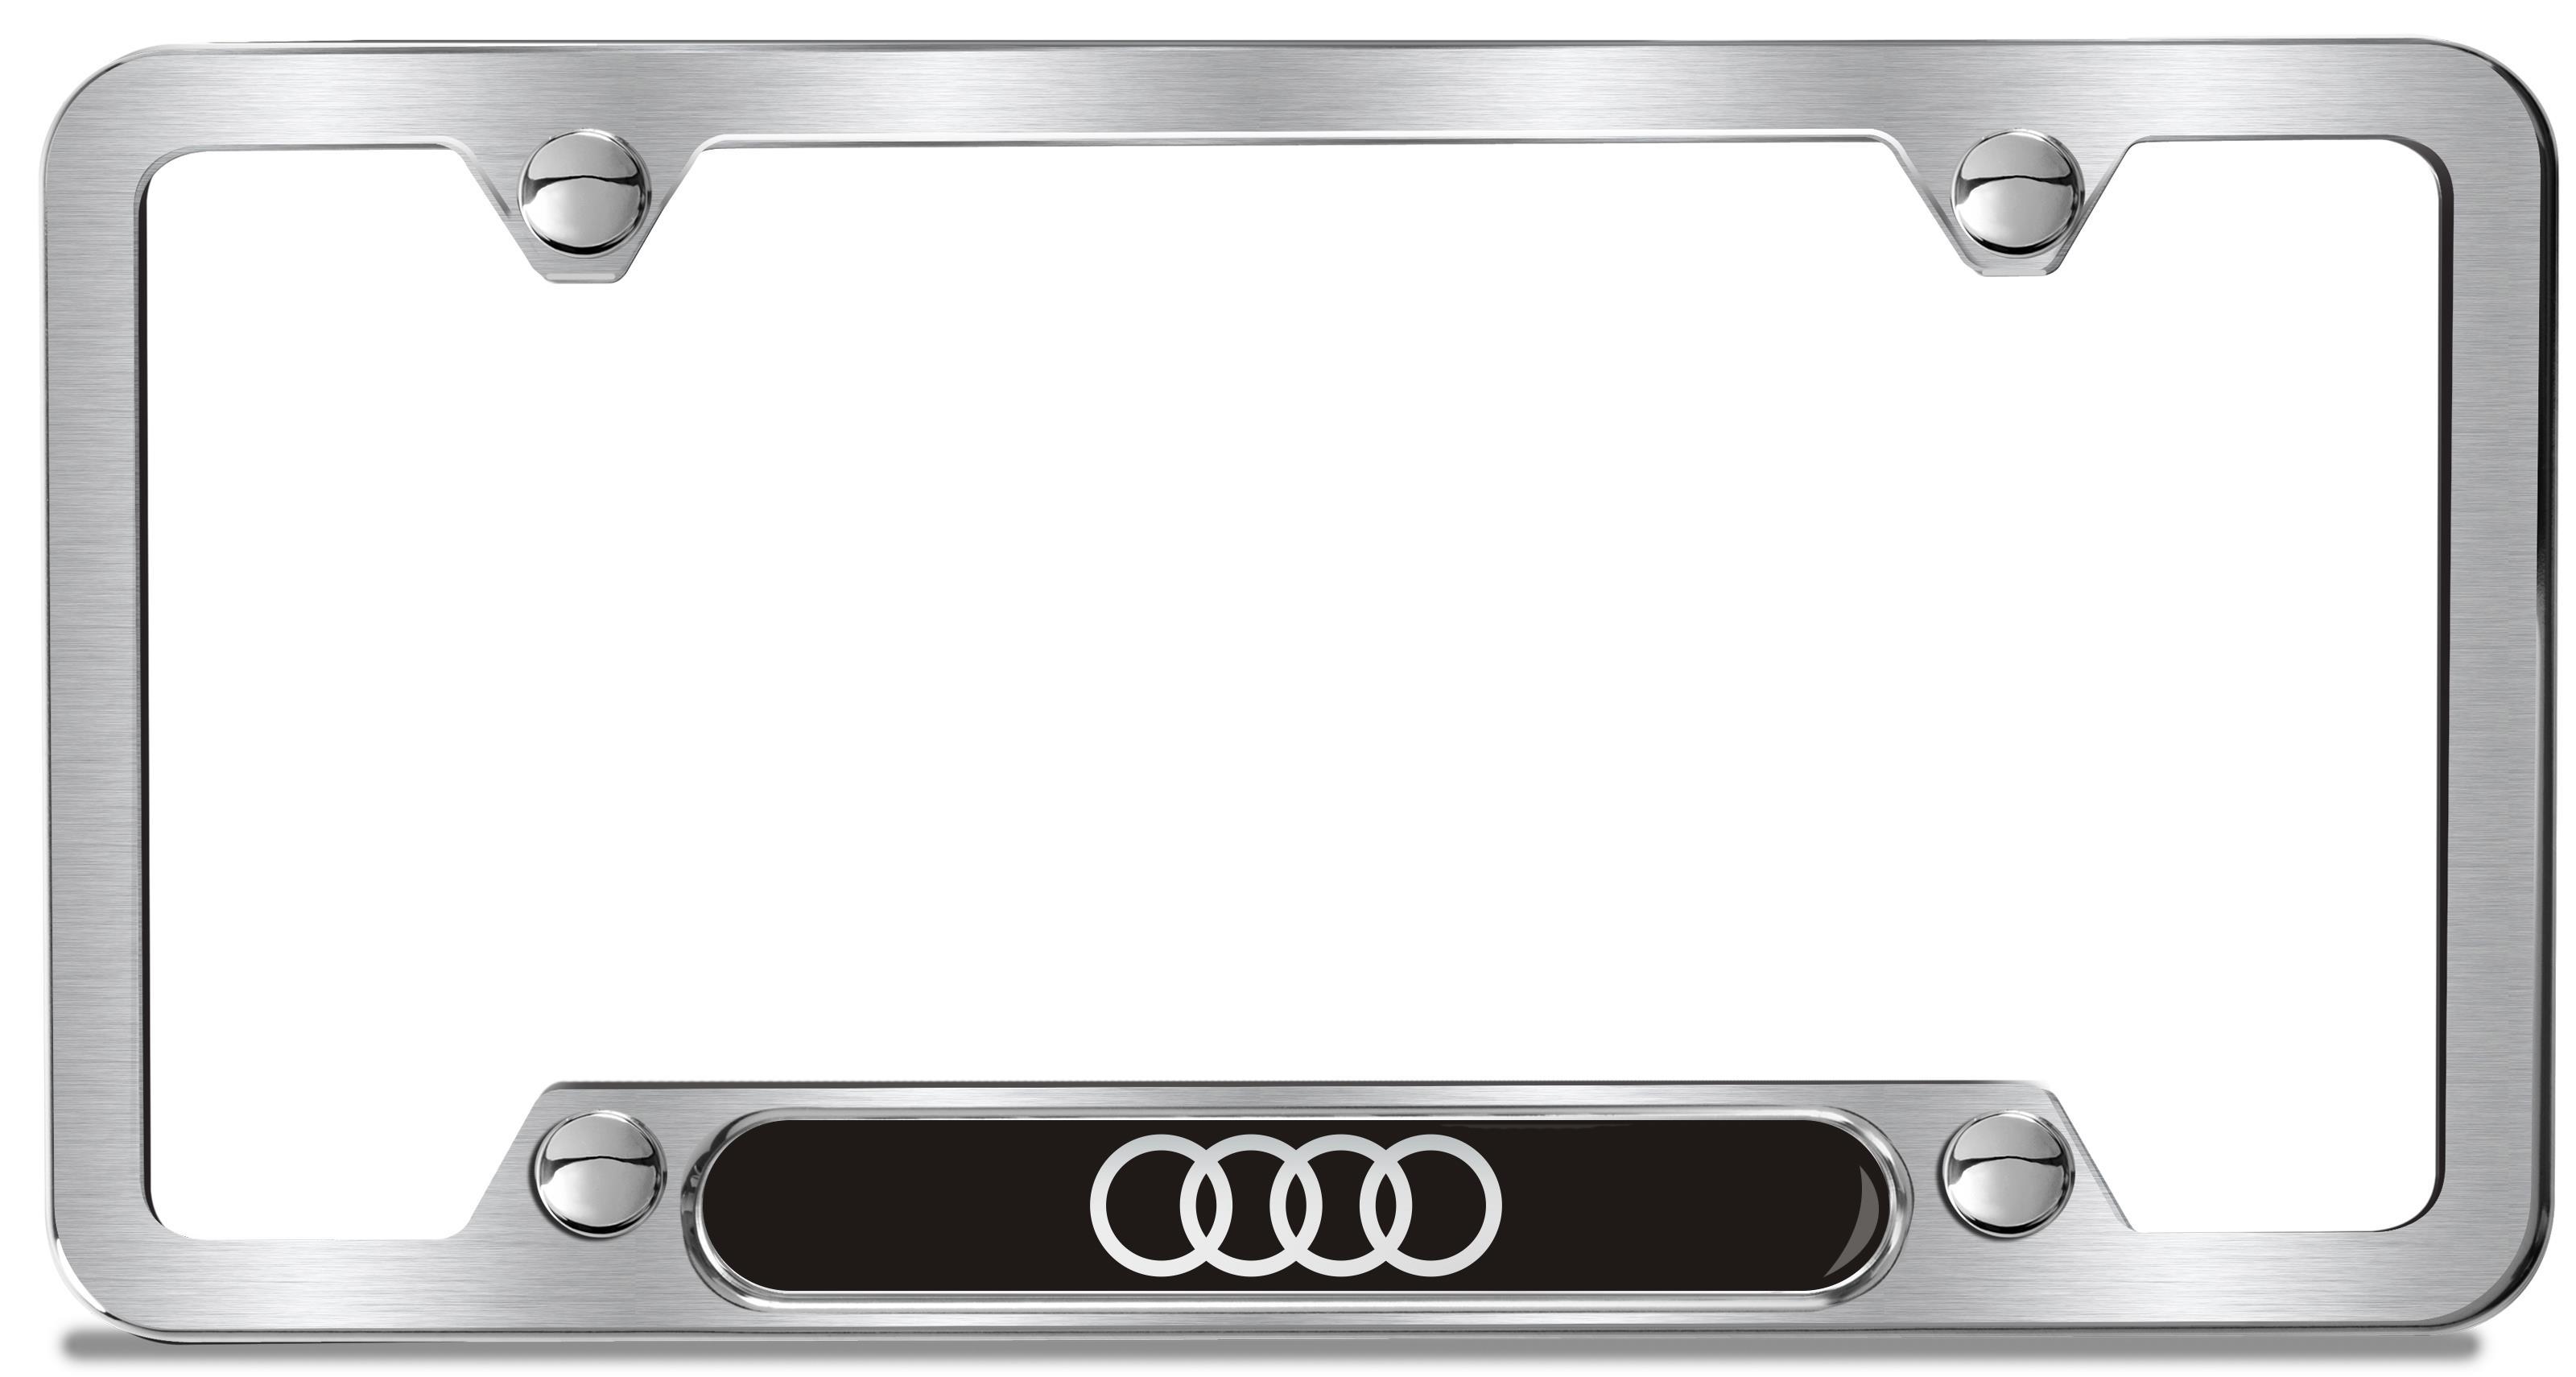 Search 2012 Audi R8 Parts